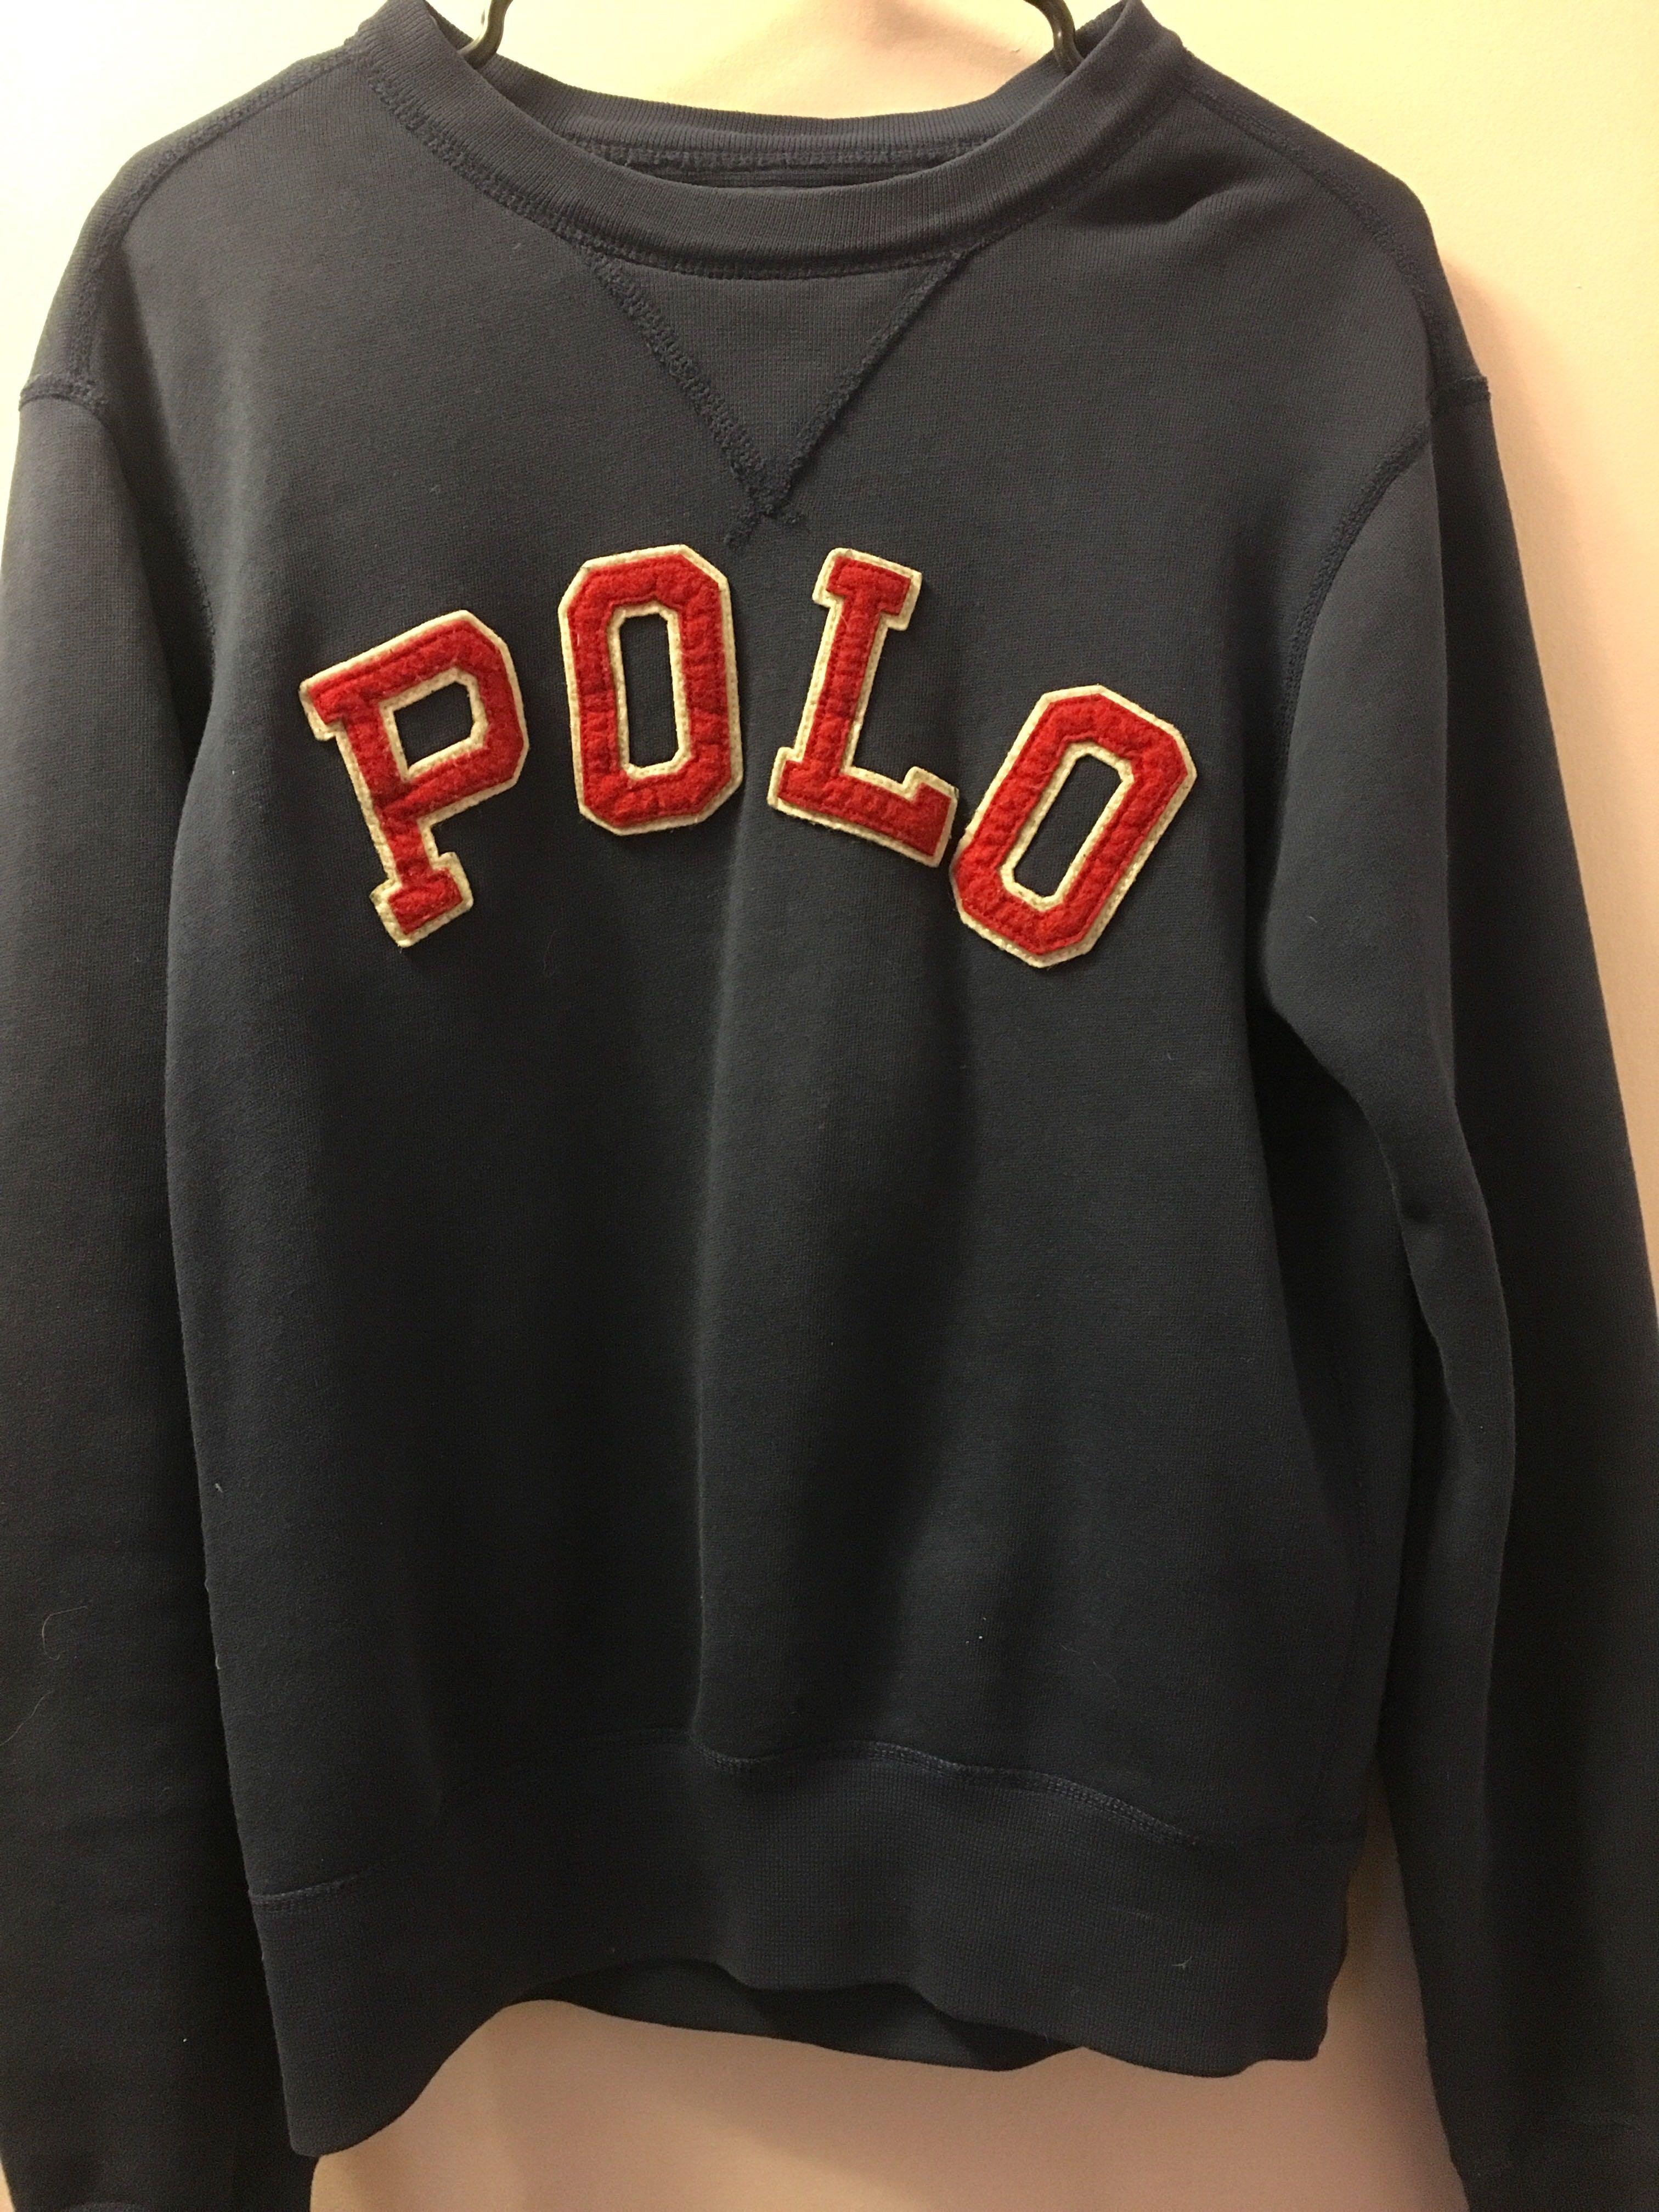 Polo Ralph Lauren Crewneck